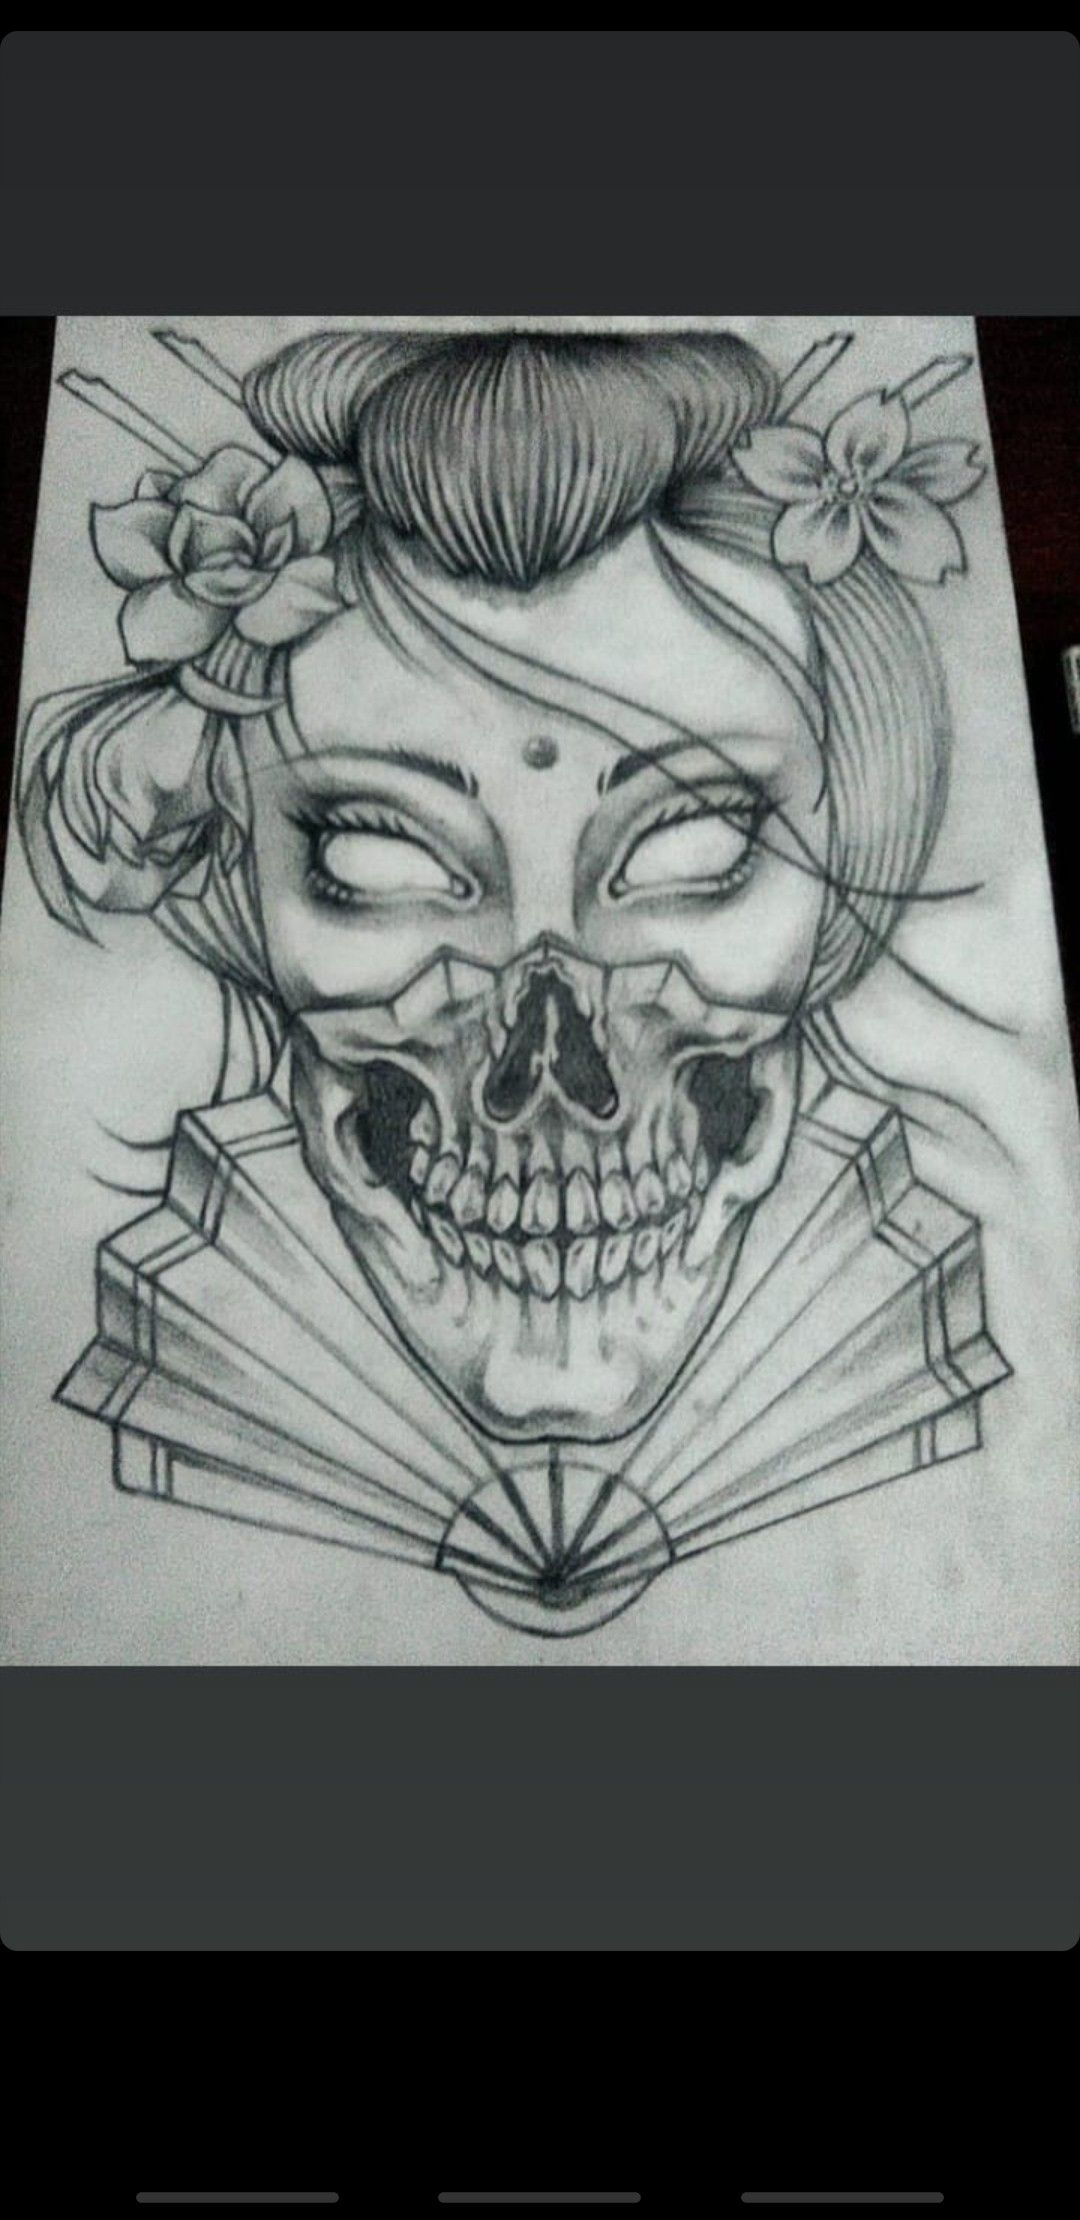 Pin By Tregub Nina On Tattoos Tattoo Design Drawings Sketches Art Tattoo